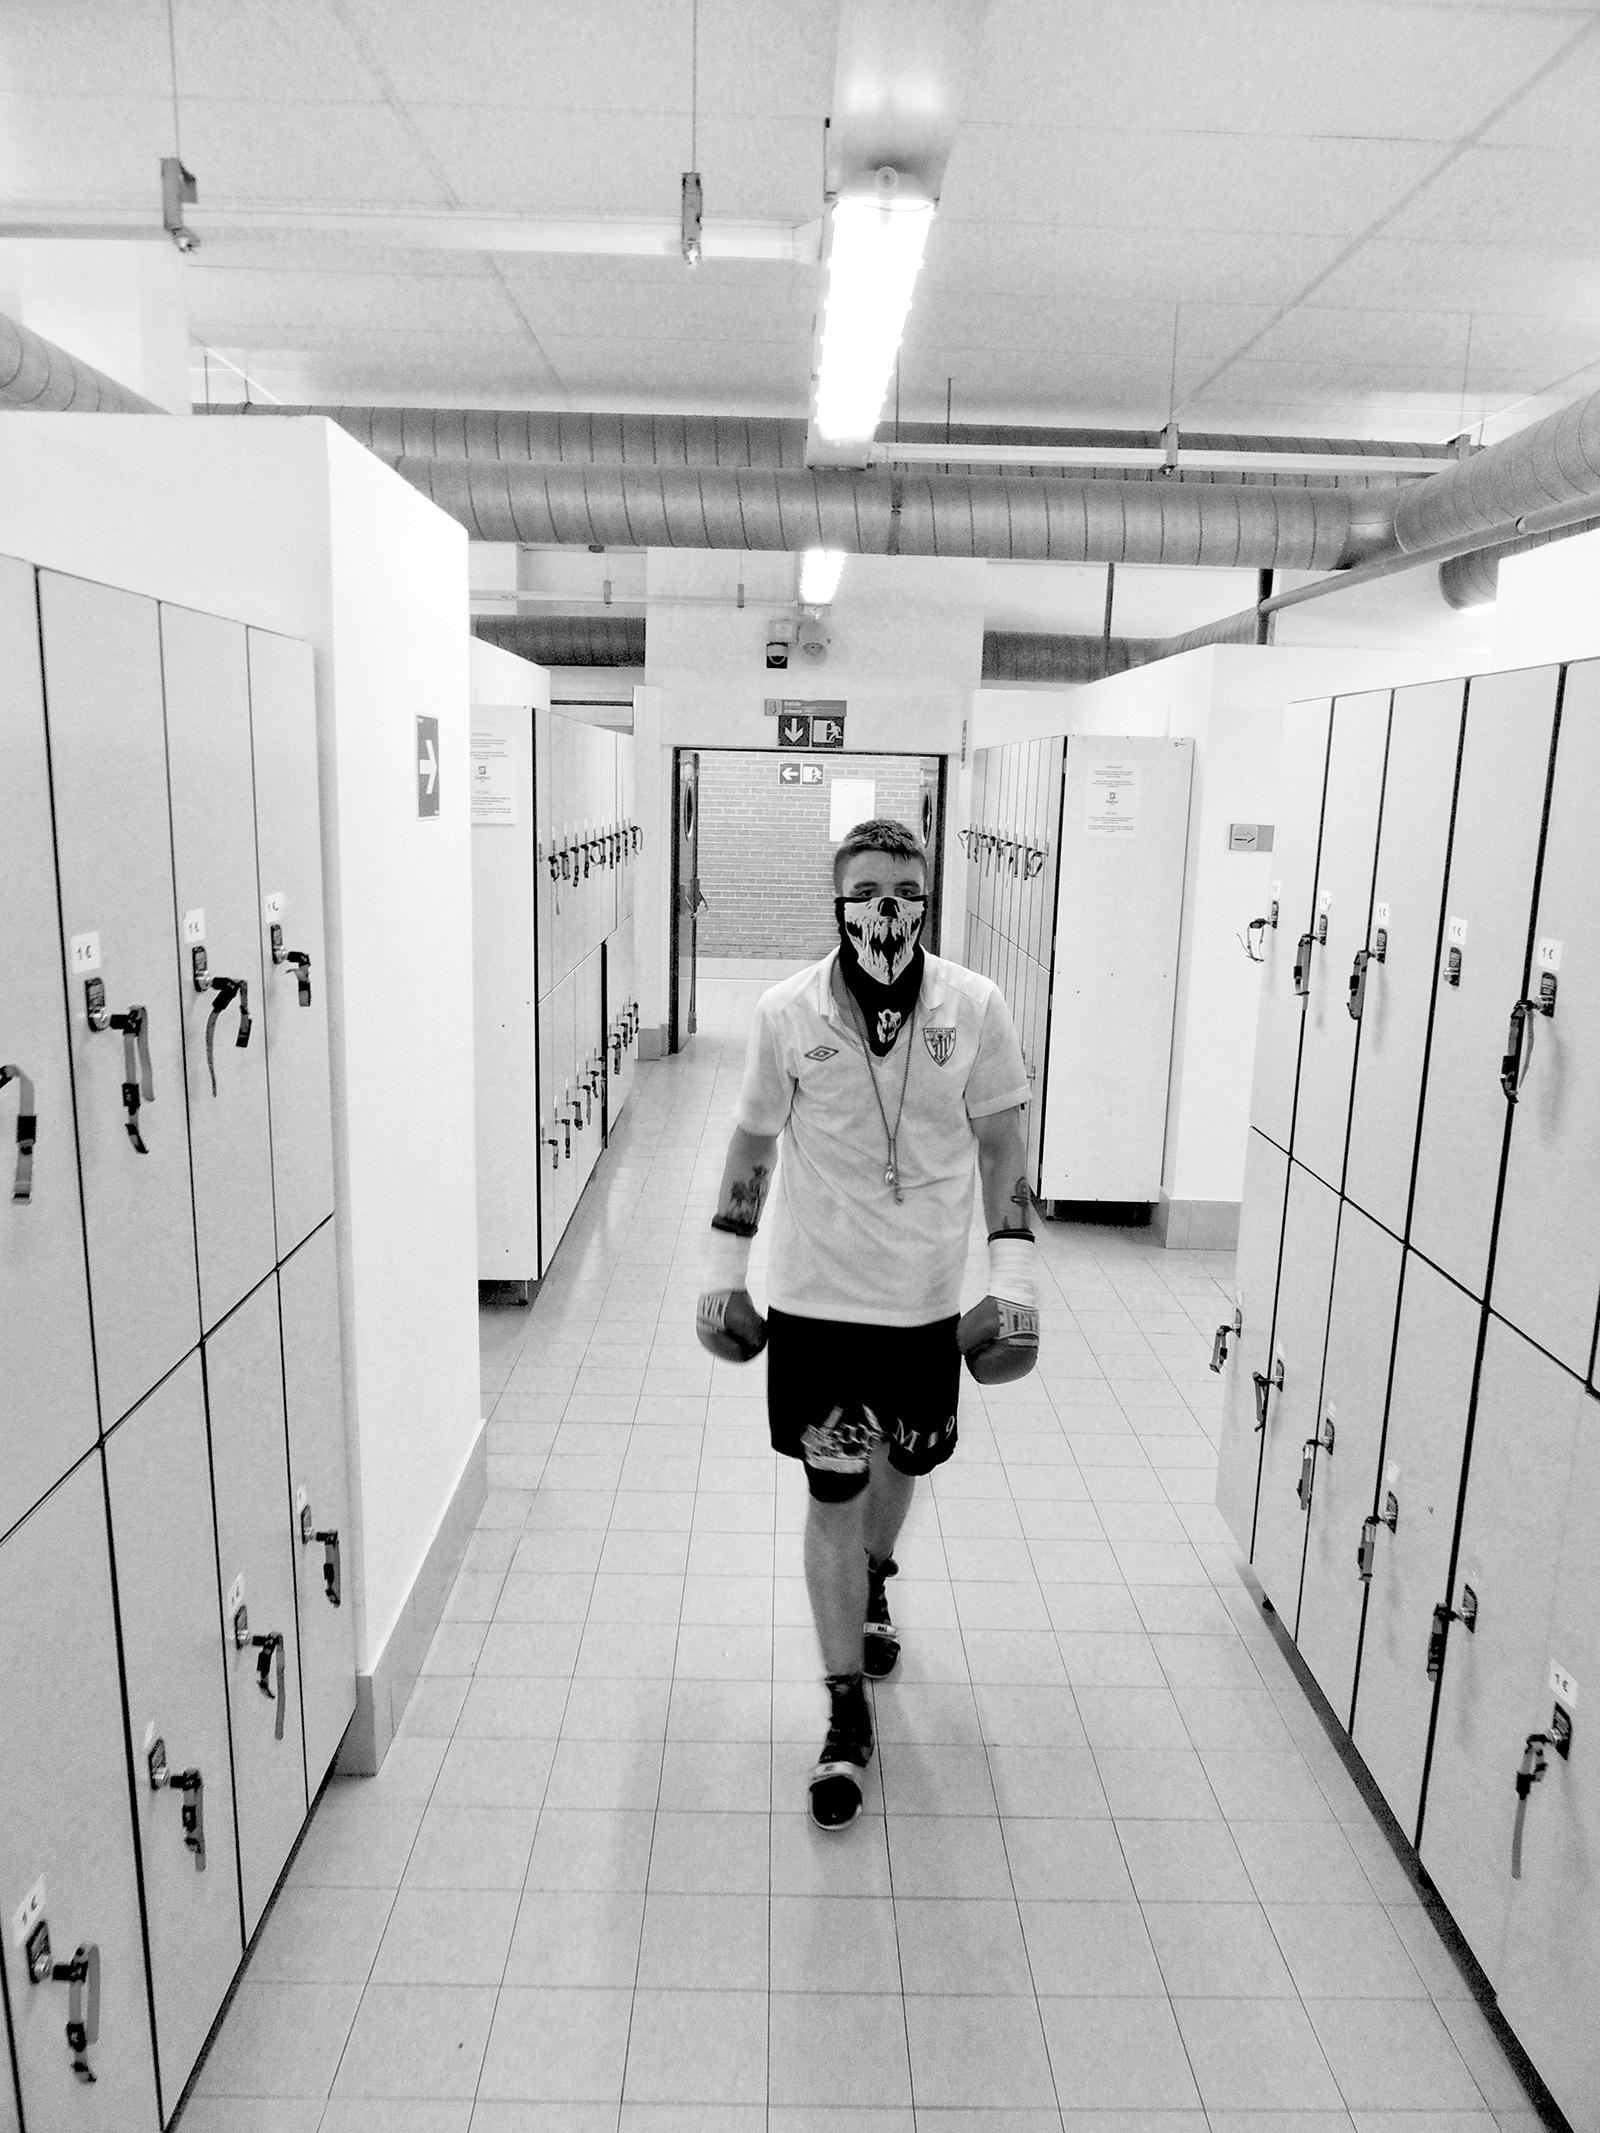 El boxeador profesional Kerman Lejarraga a punto de salir a combatir en Getxo